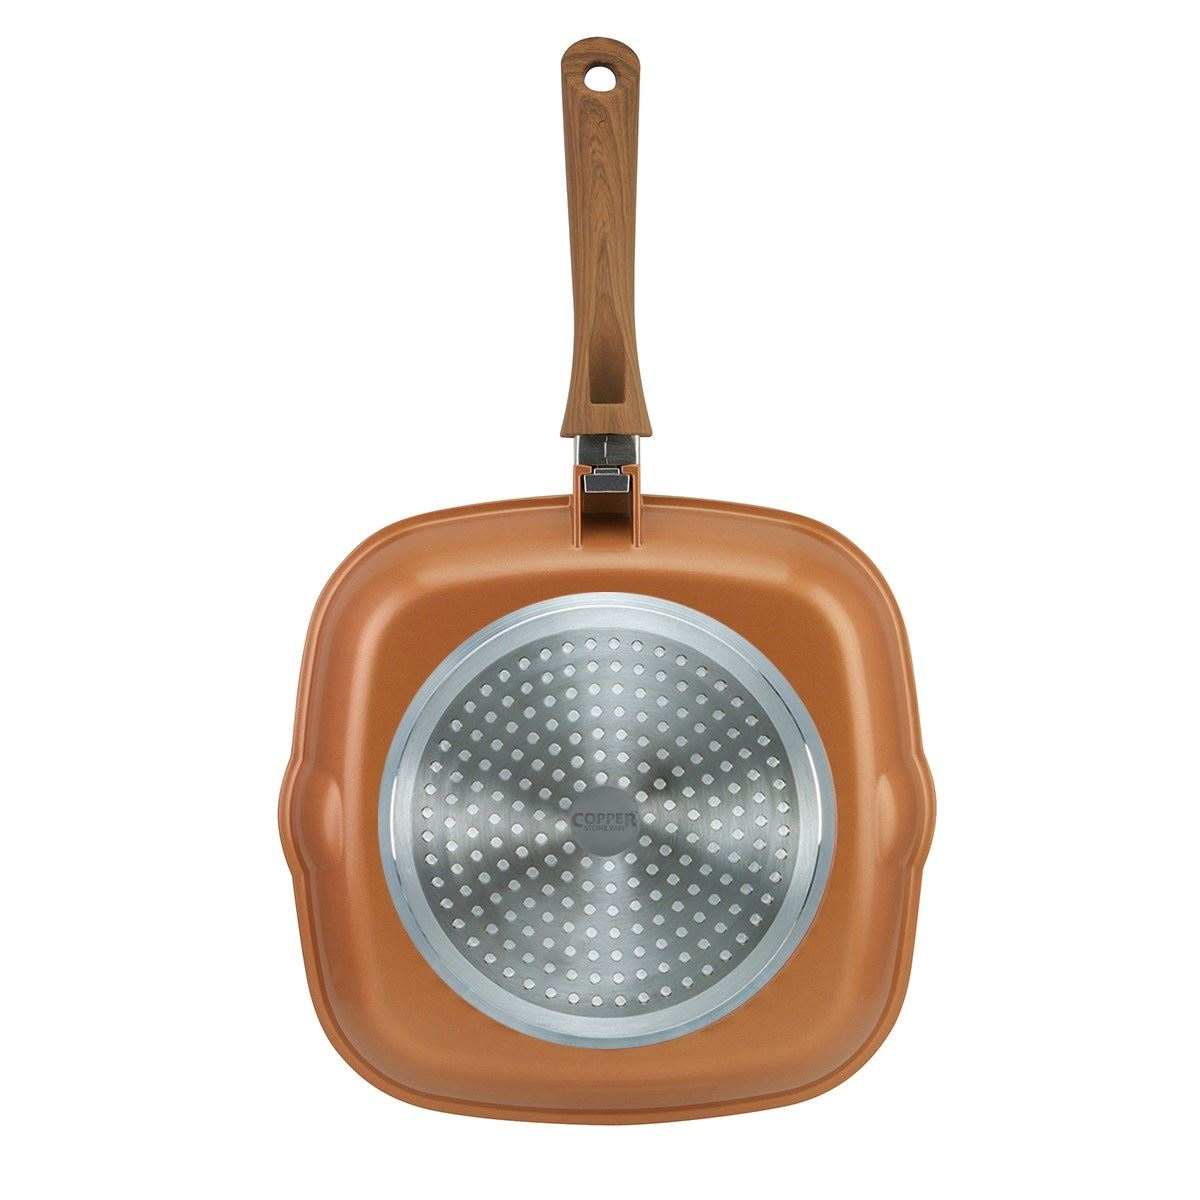 Jml Copper Stone Pans Anti Scratch Non Stick Hard Wearing